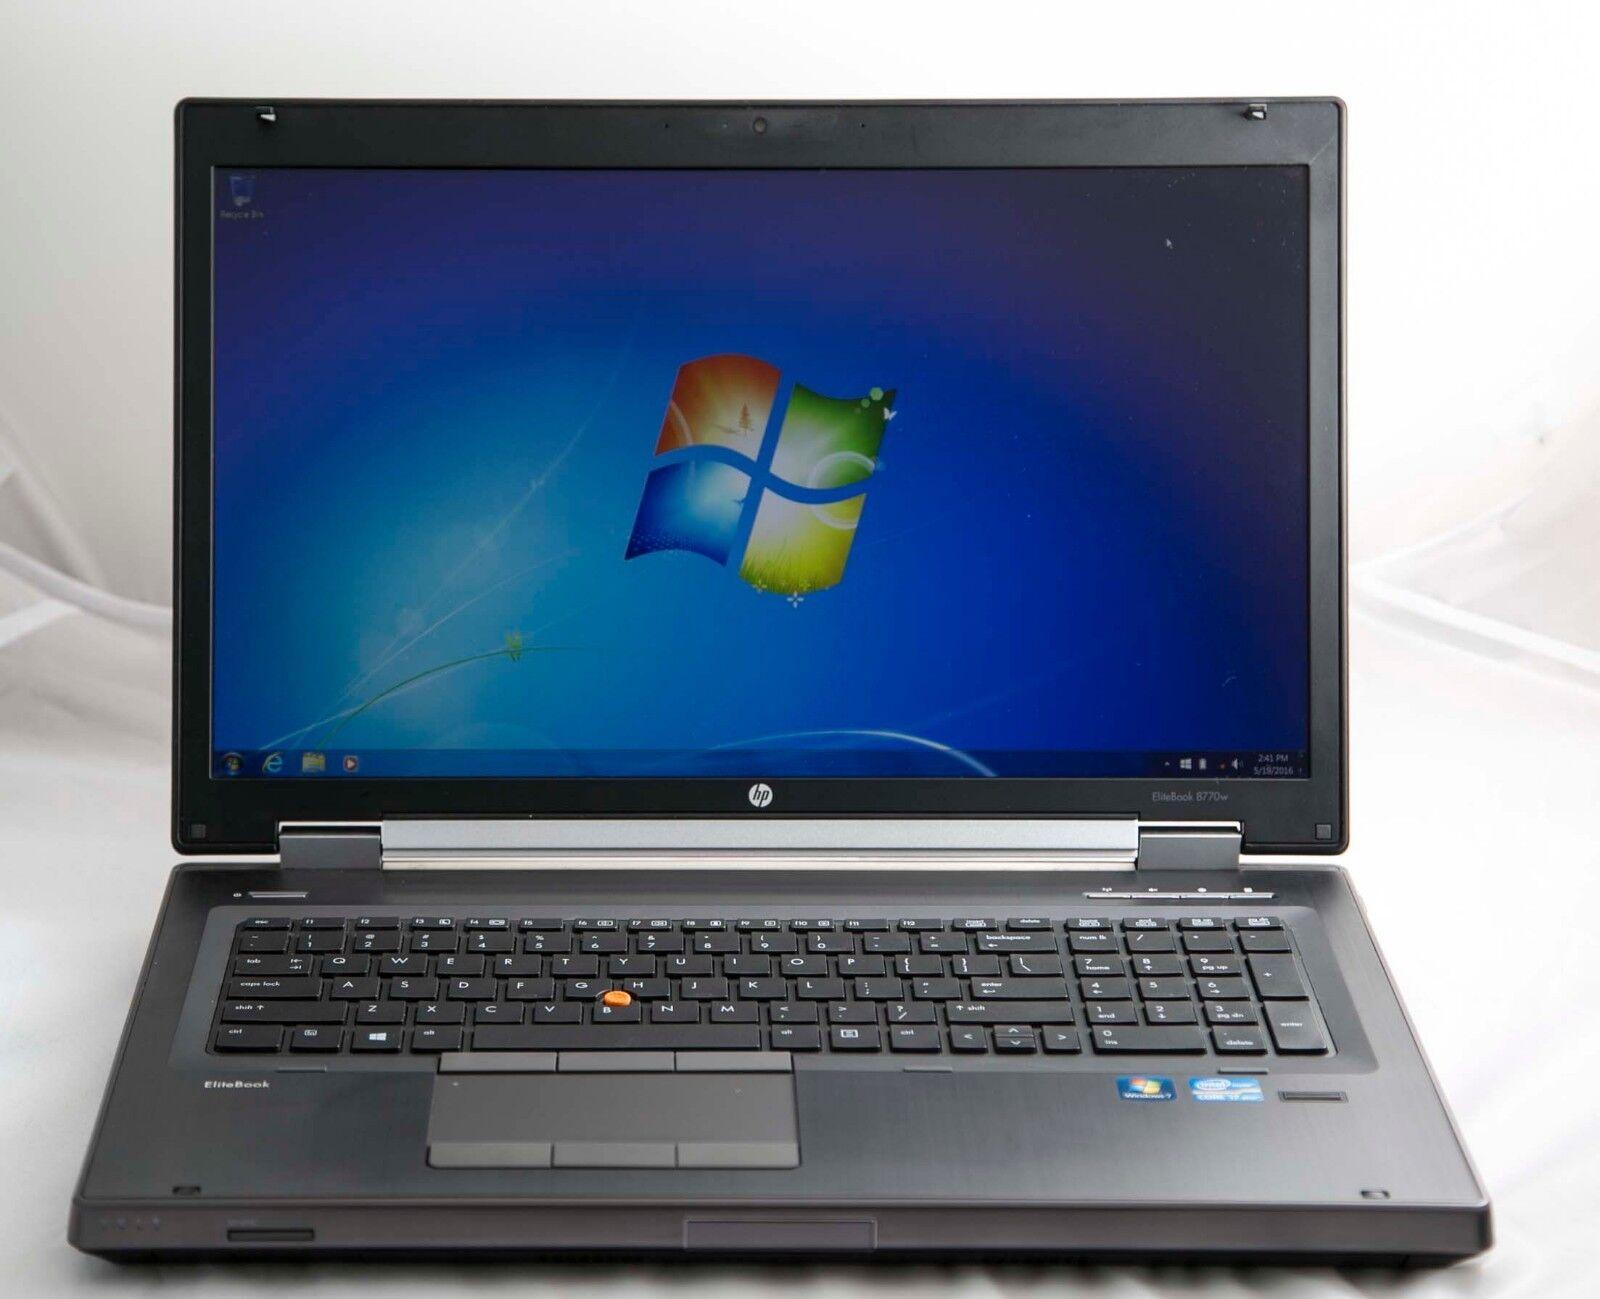 "HP EliteBook 8770w 17"" Core i7-3520M 2.9GHz 8GB 256GB SSD Webcam AMD/ATI Laptop"